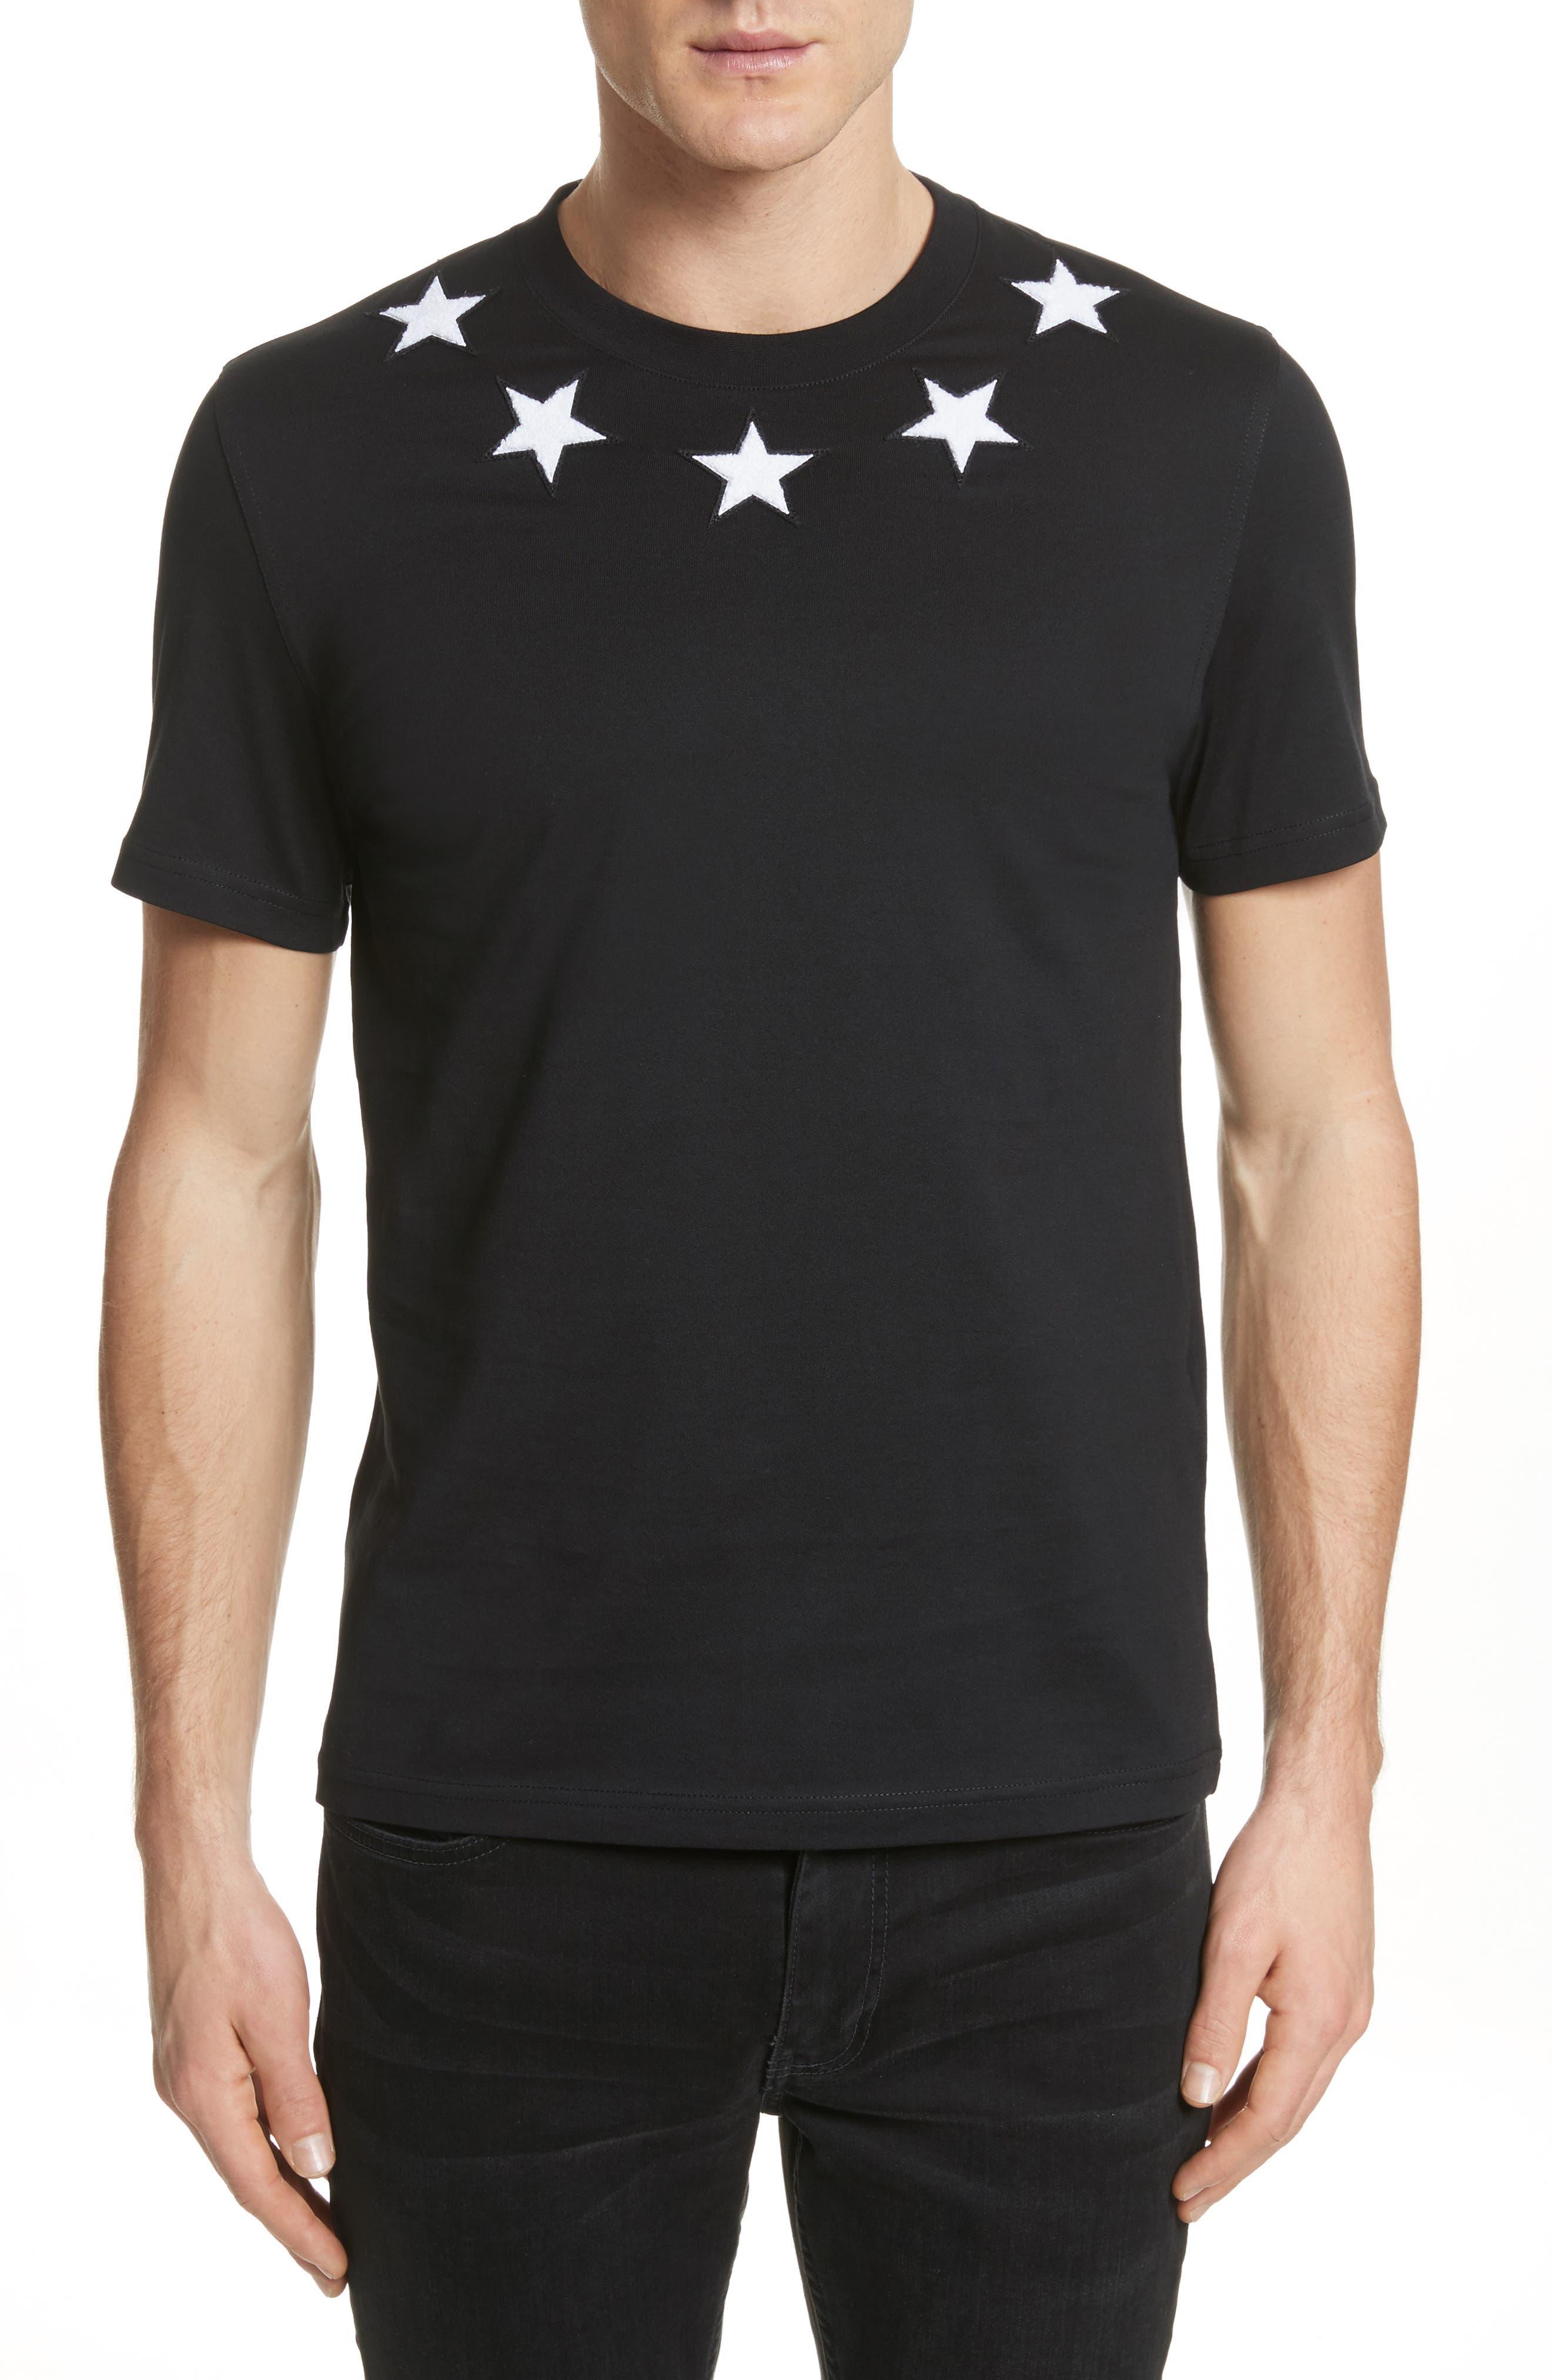 Main Image - Givenchy Star Appliqué T-Shirt